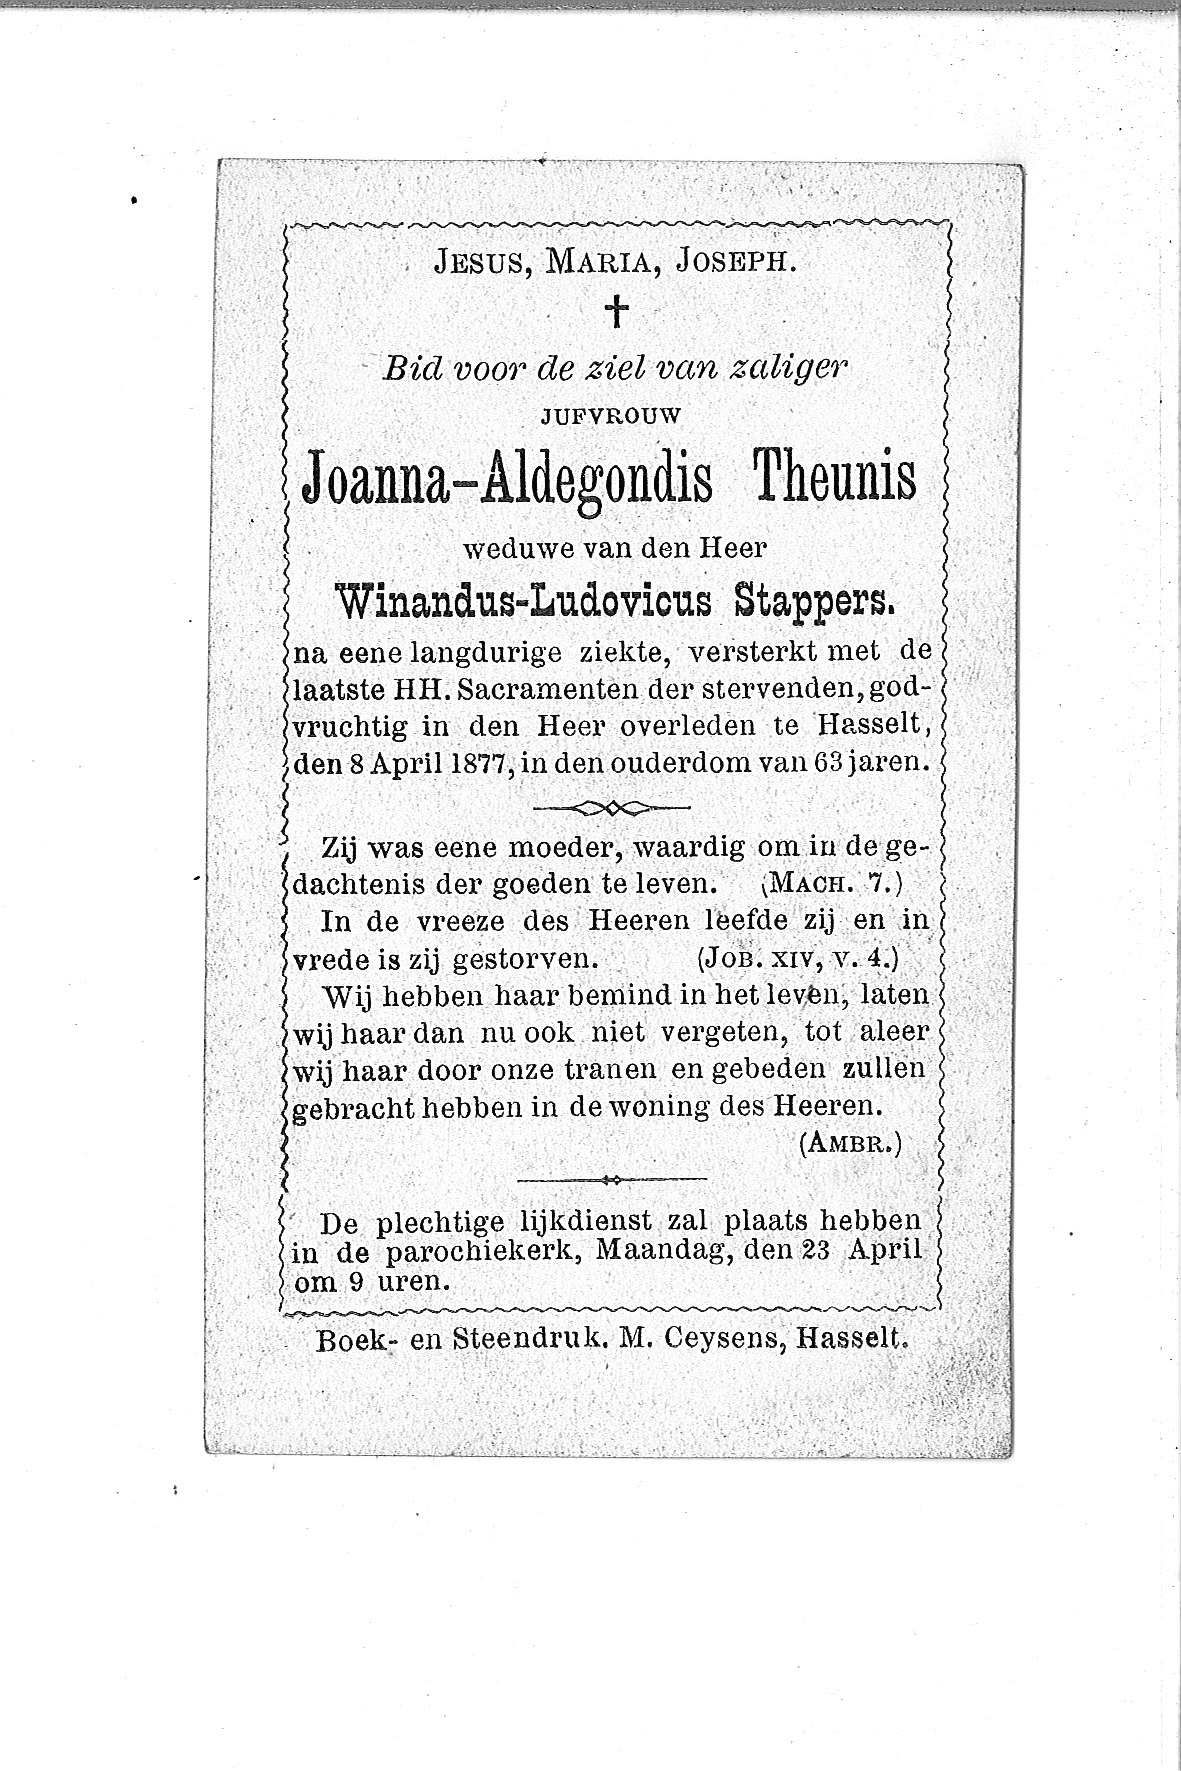 Joanna-Aldegondis(1877)20120621134457_00037.jpg